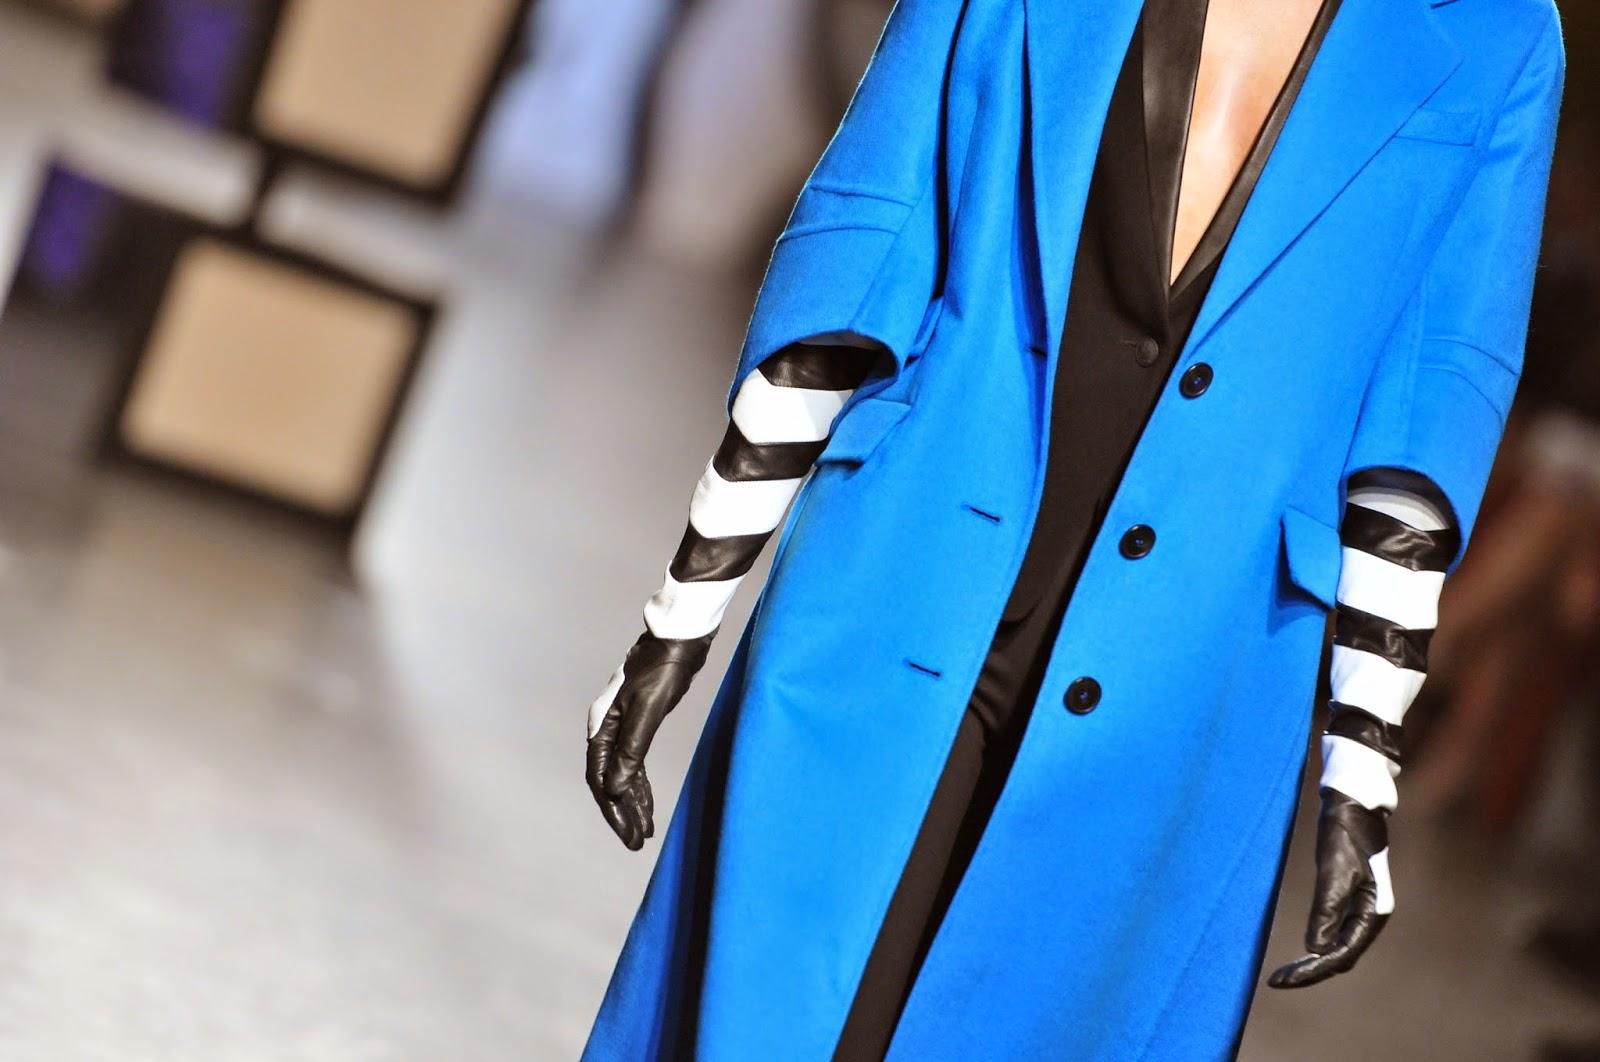 Nordstrom+Designer+Preview+2014+-+Photo+by+Vivian+Hsu-1.JPG